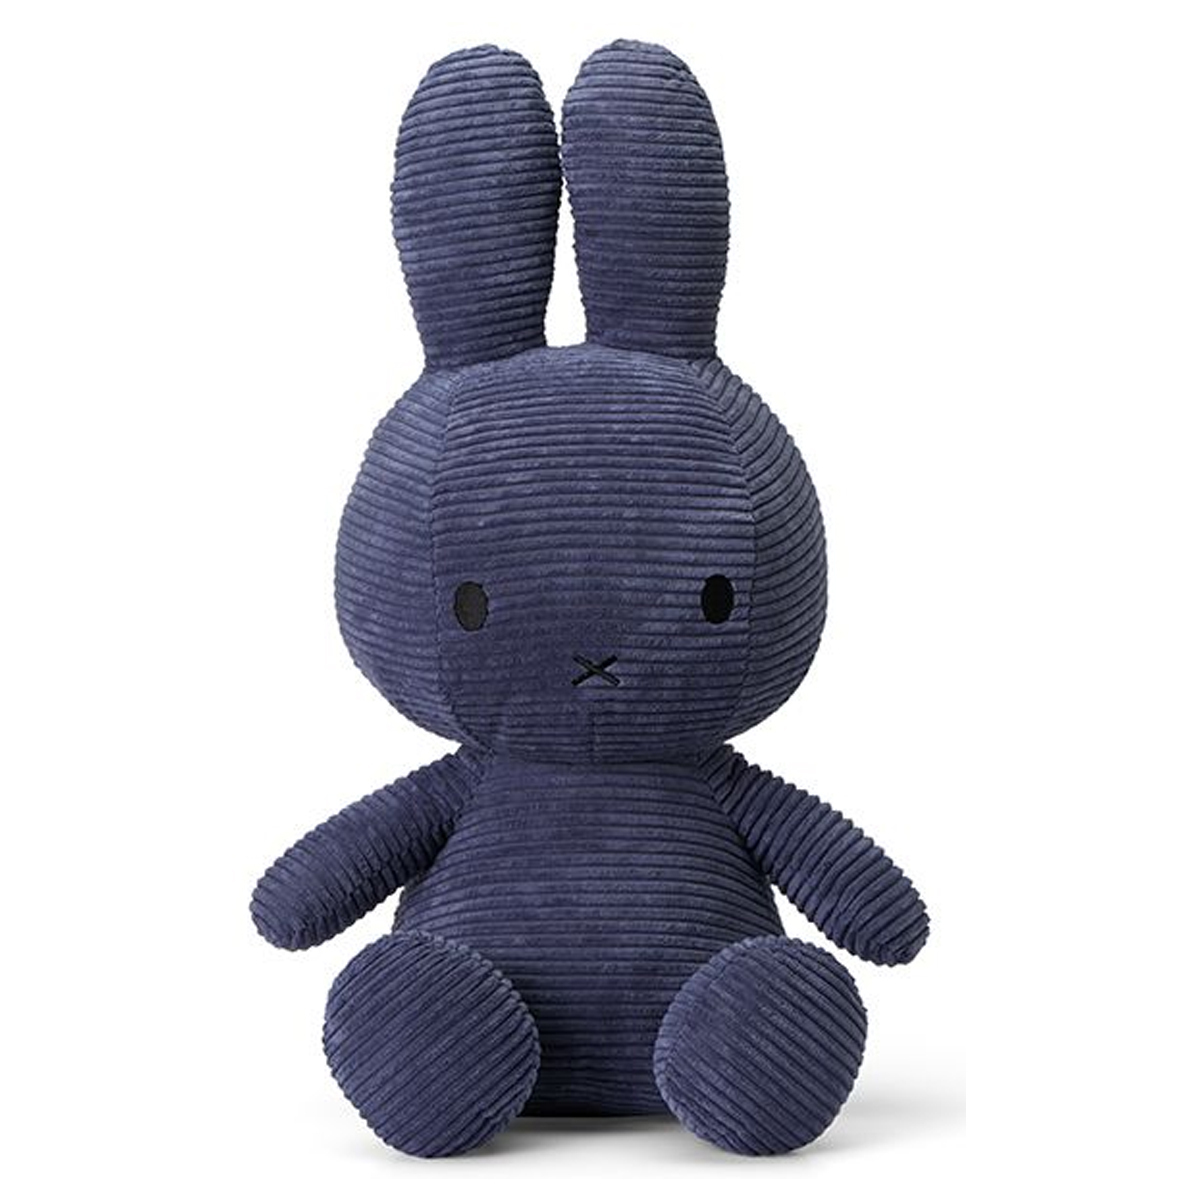 Peluche Lapin Miffy Bleu Nuit - Grand Peluche Lapin Miffy Bleu Nuit 50 cm